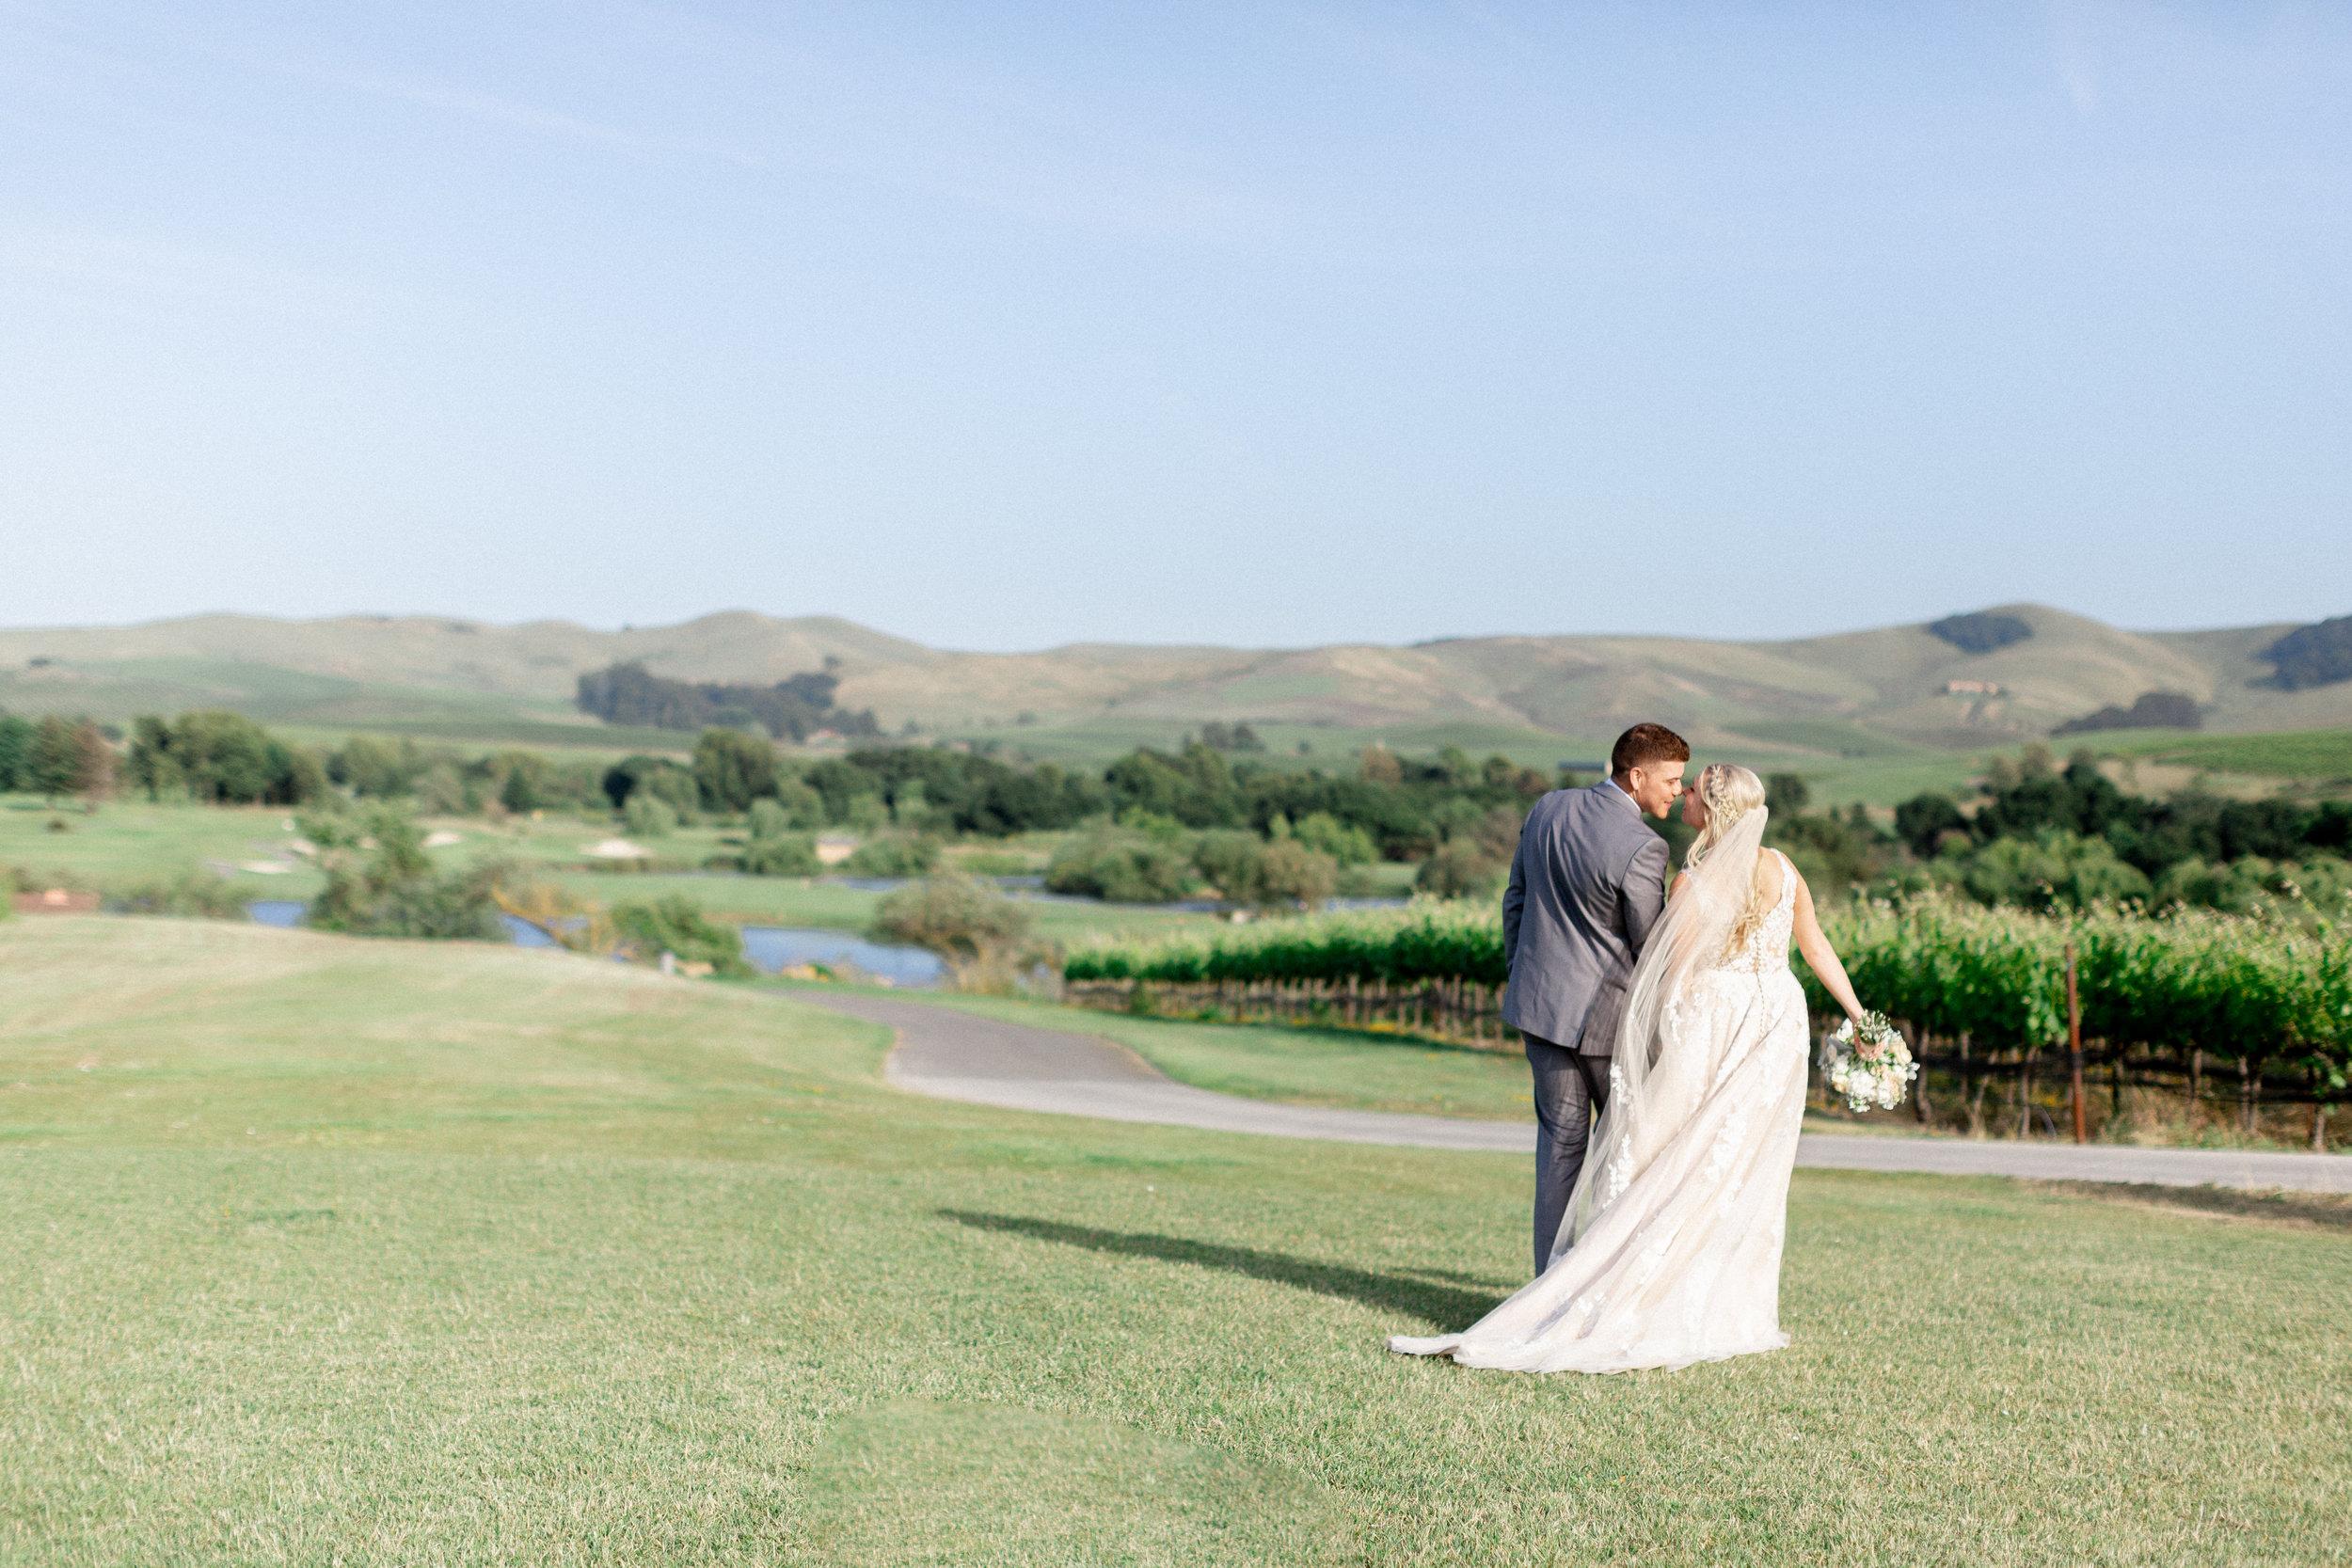 Eagle-Vines-Golf-Course-wedding-photographer (134 of 206).jpg